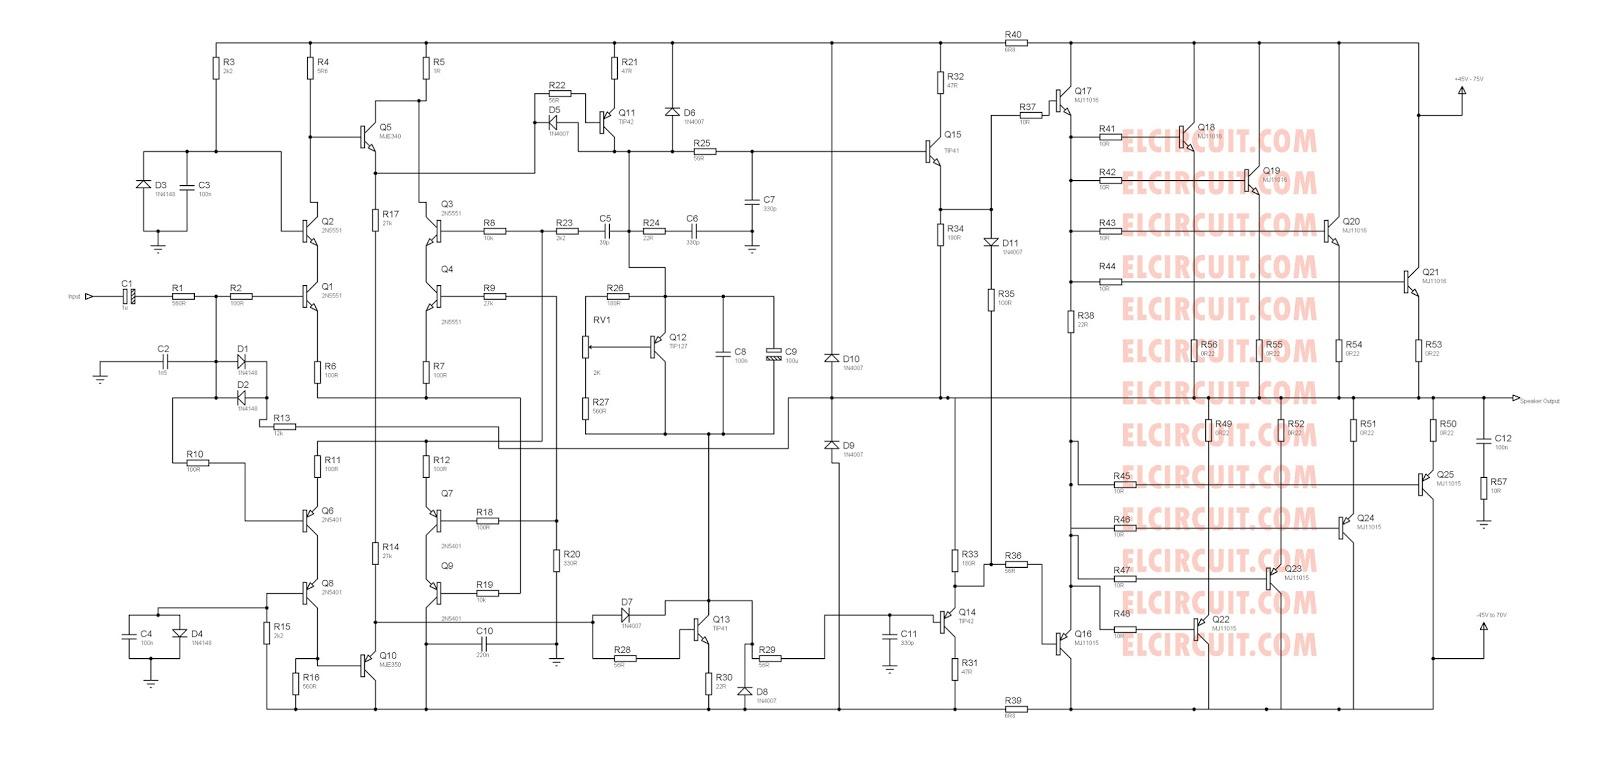 2500w power amp cct diagrams wiring library 2500w power amp cct diagrams [ 1600 x 758 Pixel ]